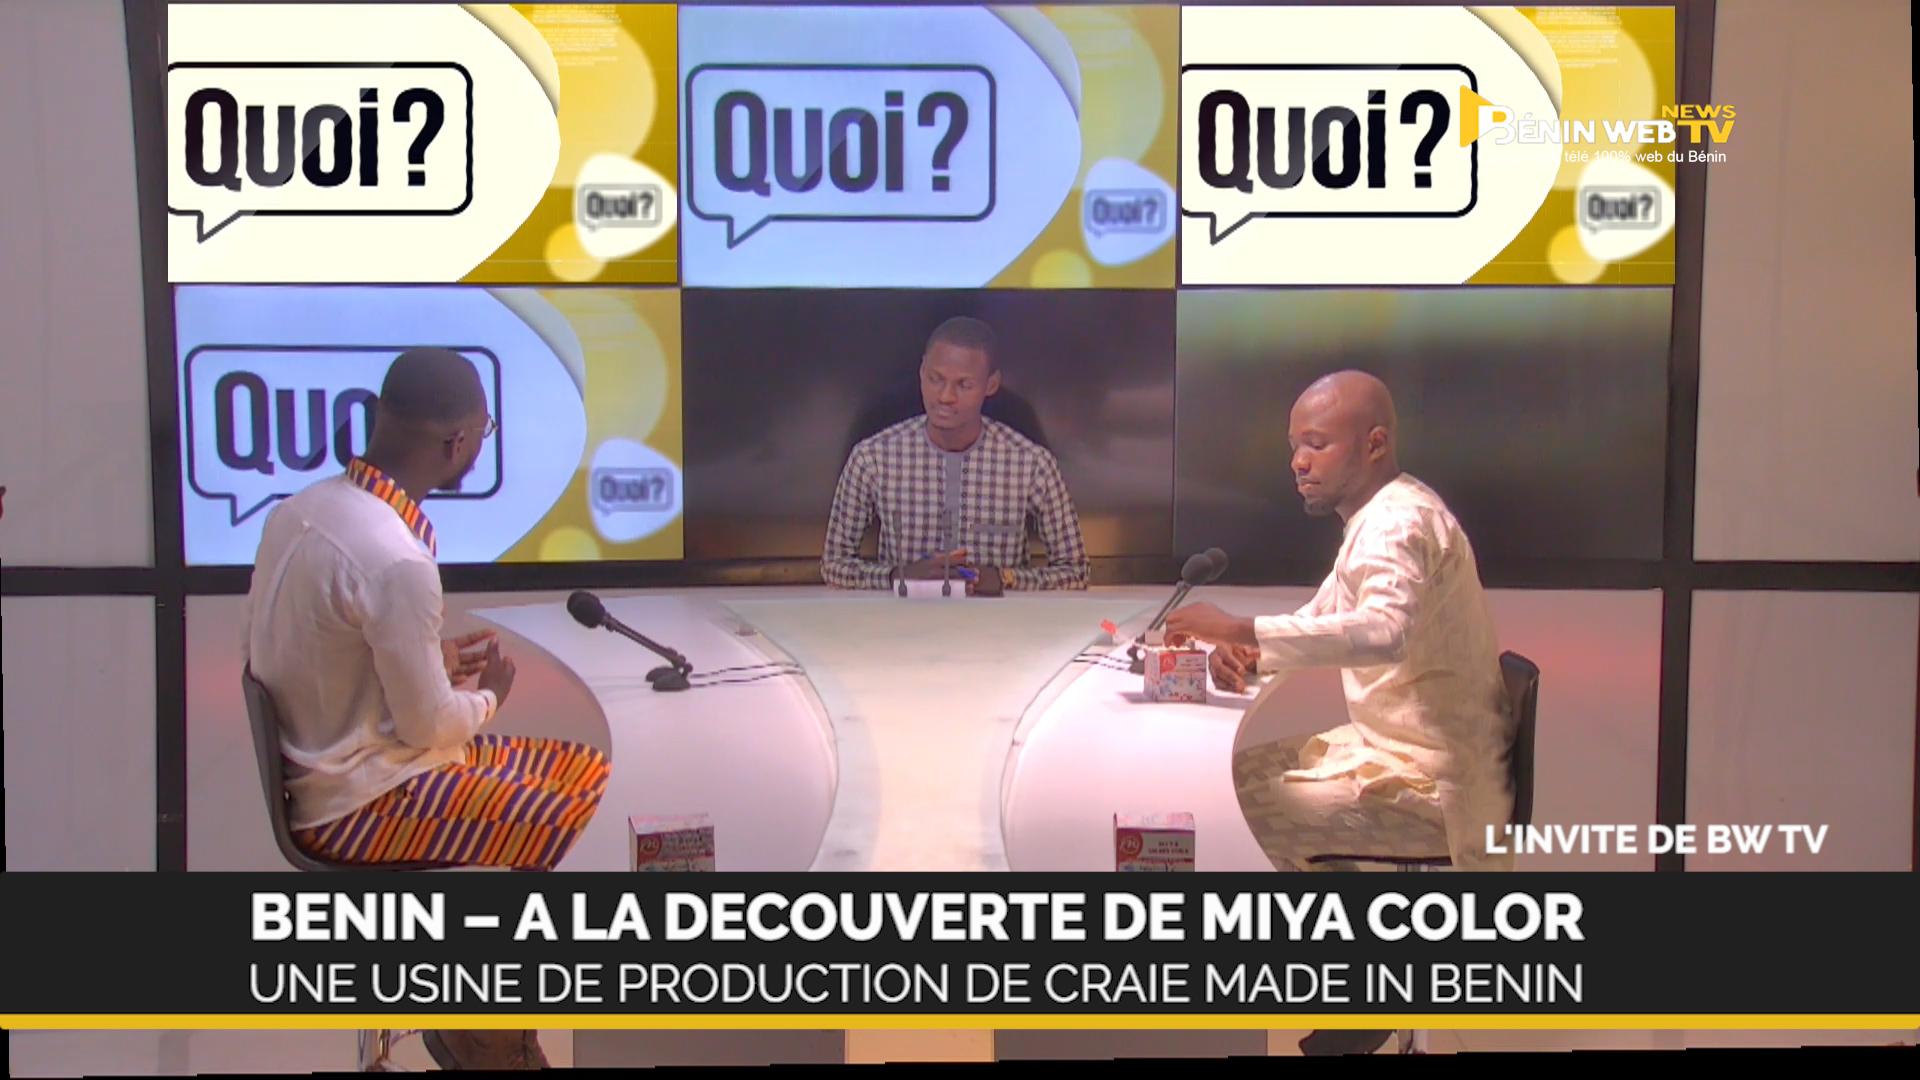 [vidéo] A la découverte de Miya Color, une usine de production de la Craie, Made in Benin